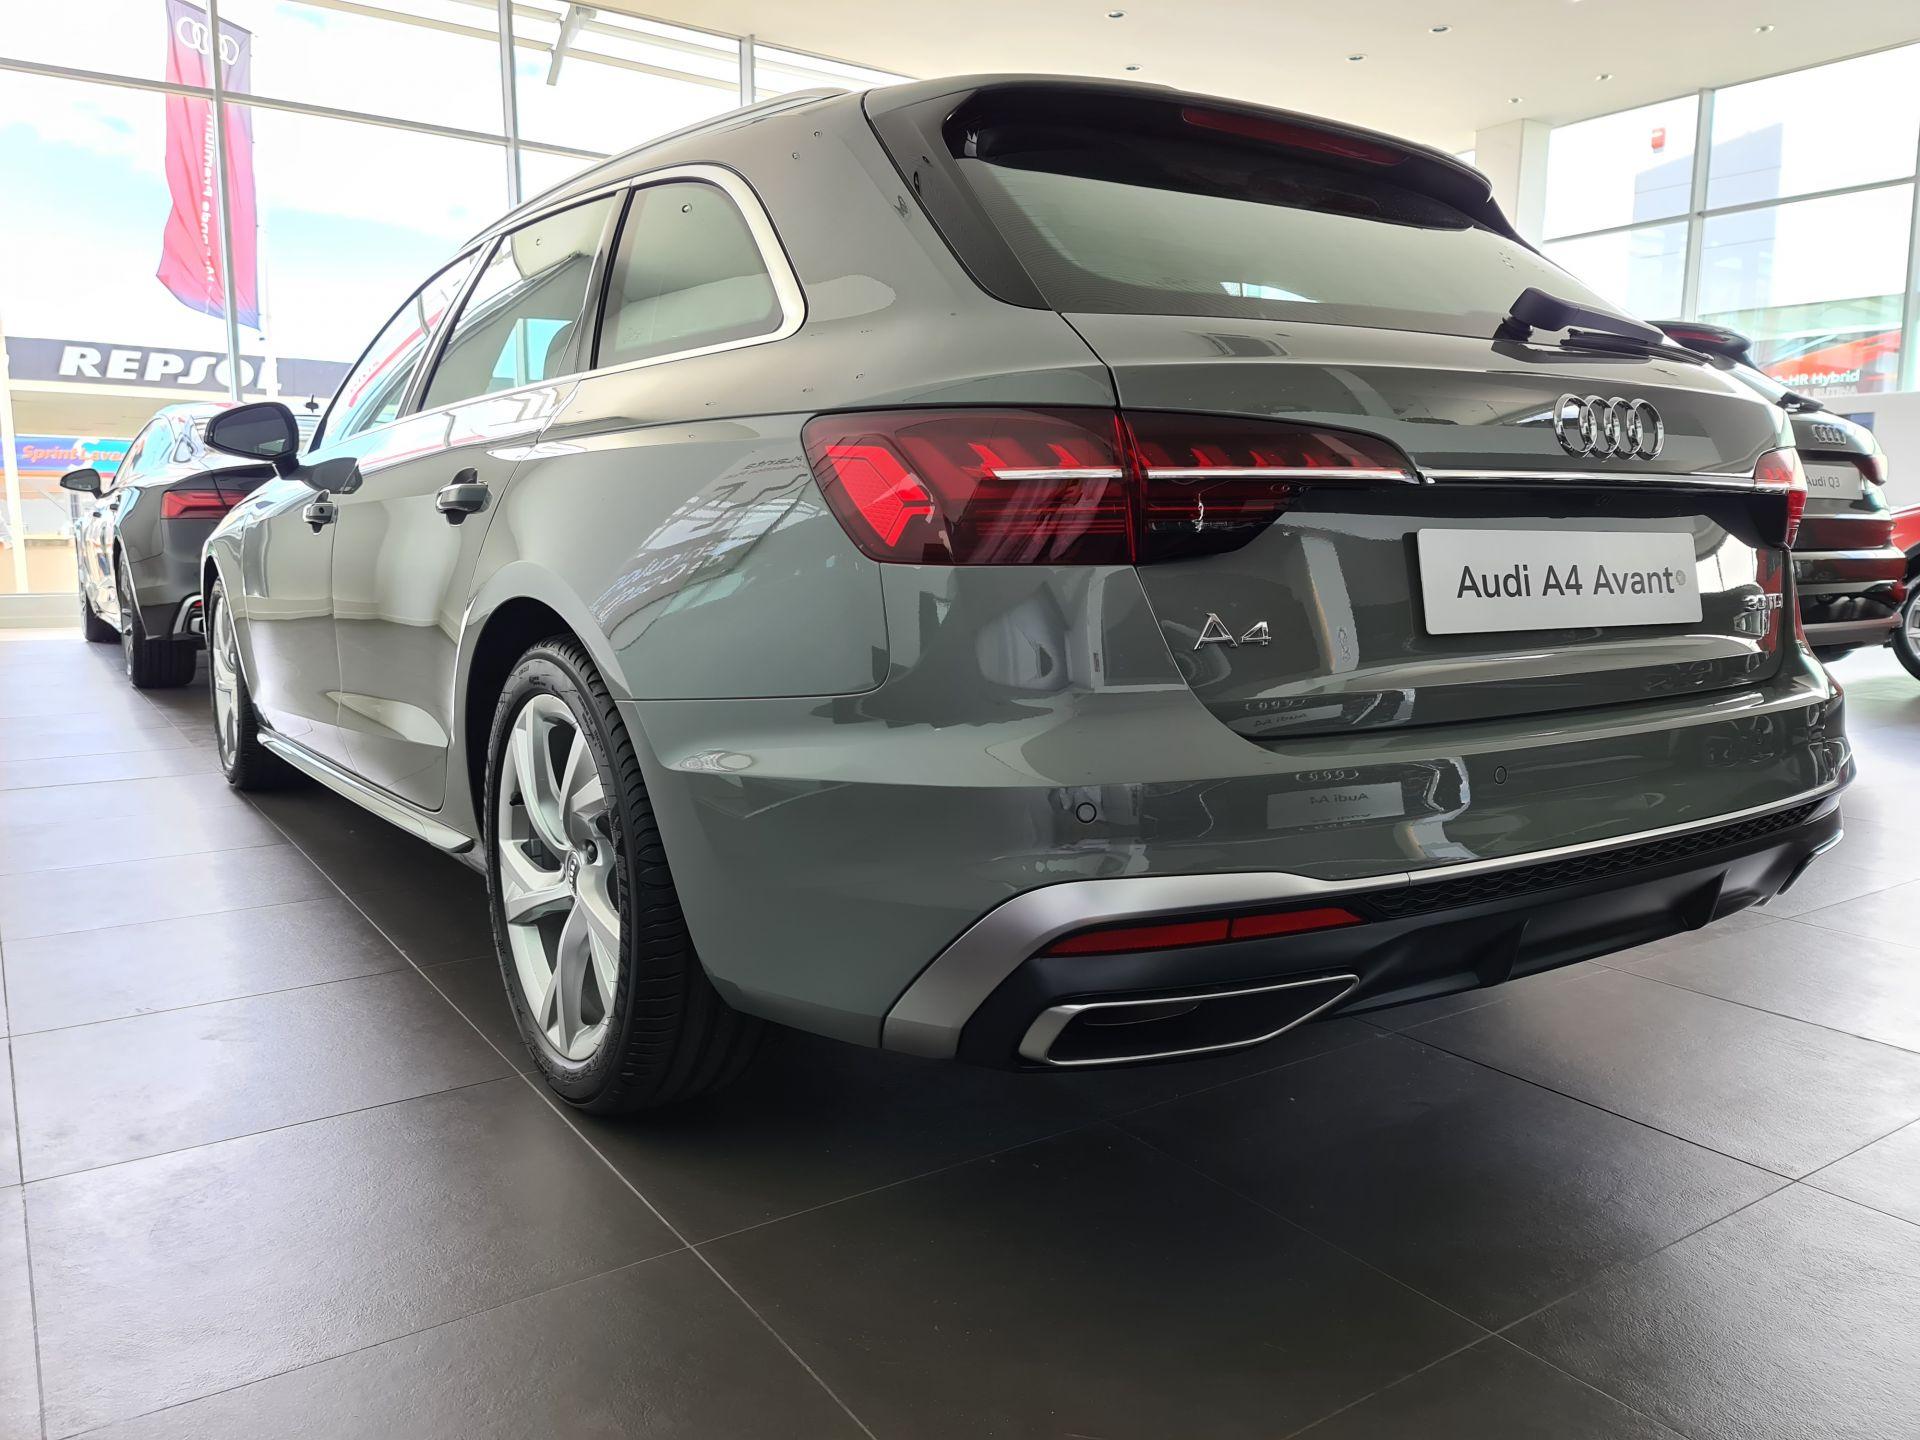 Audi A4 Avant S line 30 TDI 100kW S tronic nuevo Madrid